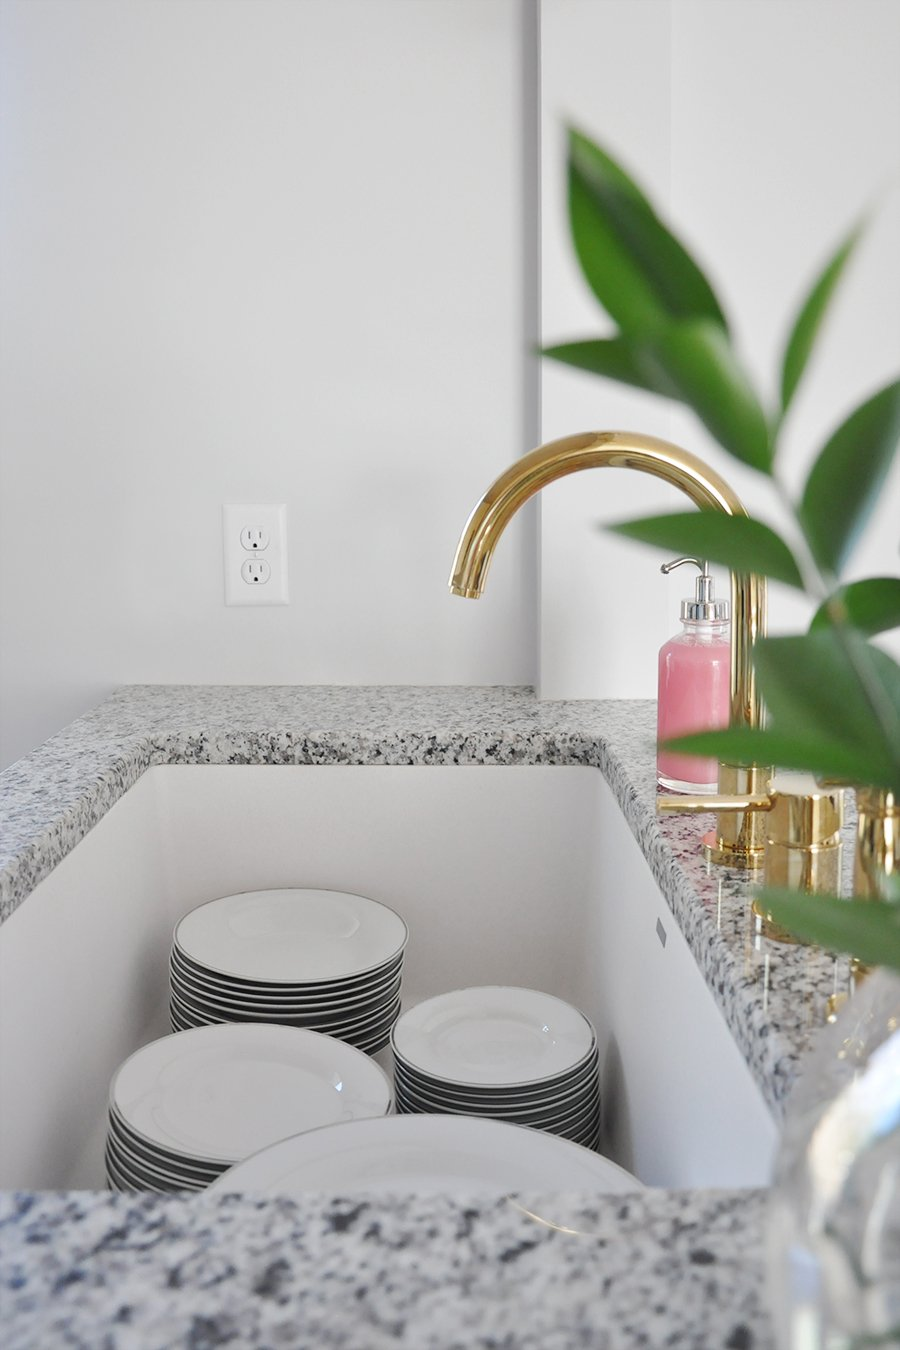 making the case for white undermount kitchen sinks undermount kitchen sink white Making the Case for White Undermount Kitchen Sinks